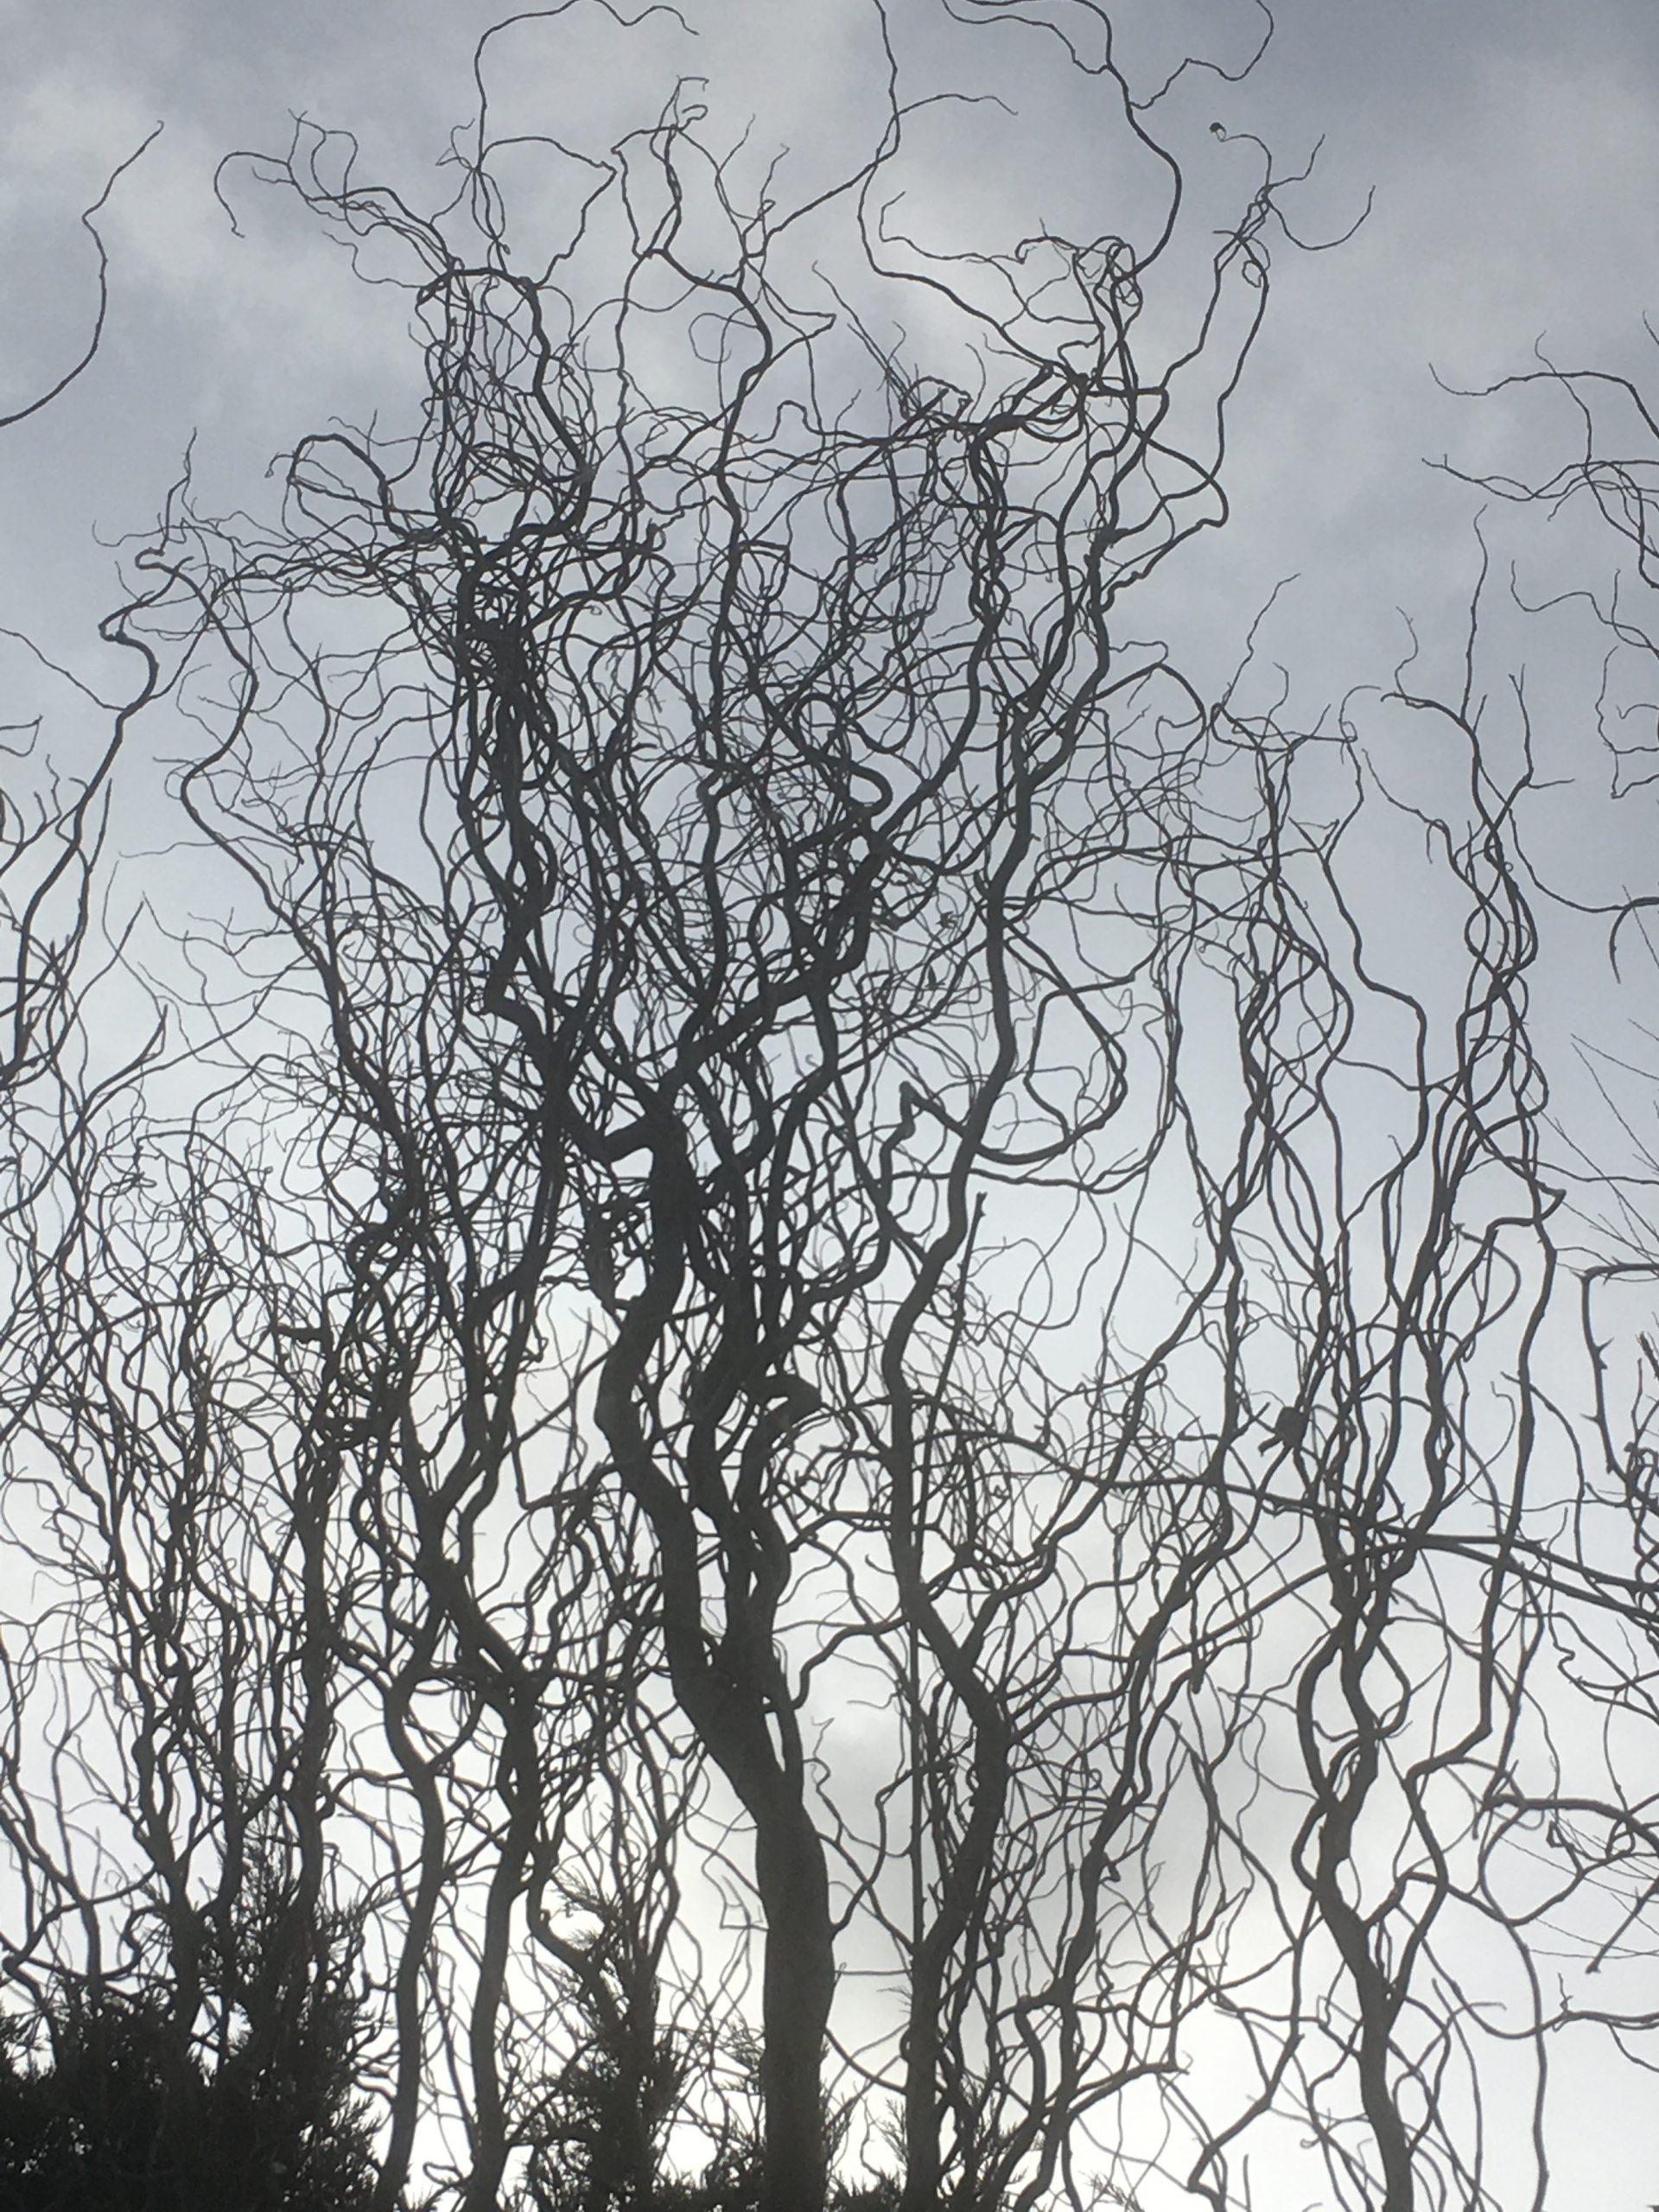 Salix Matsudana 'Tortuosa' (Corkscrew or Dragons Claw Willow)